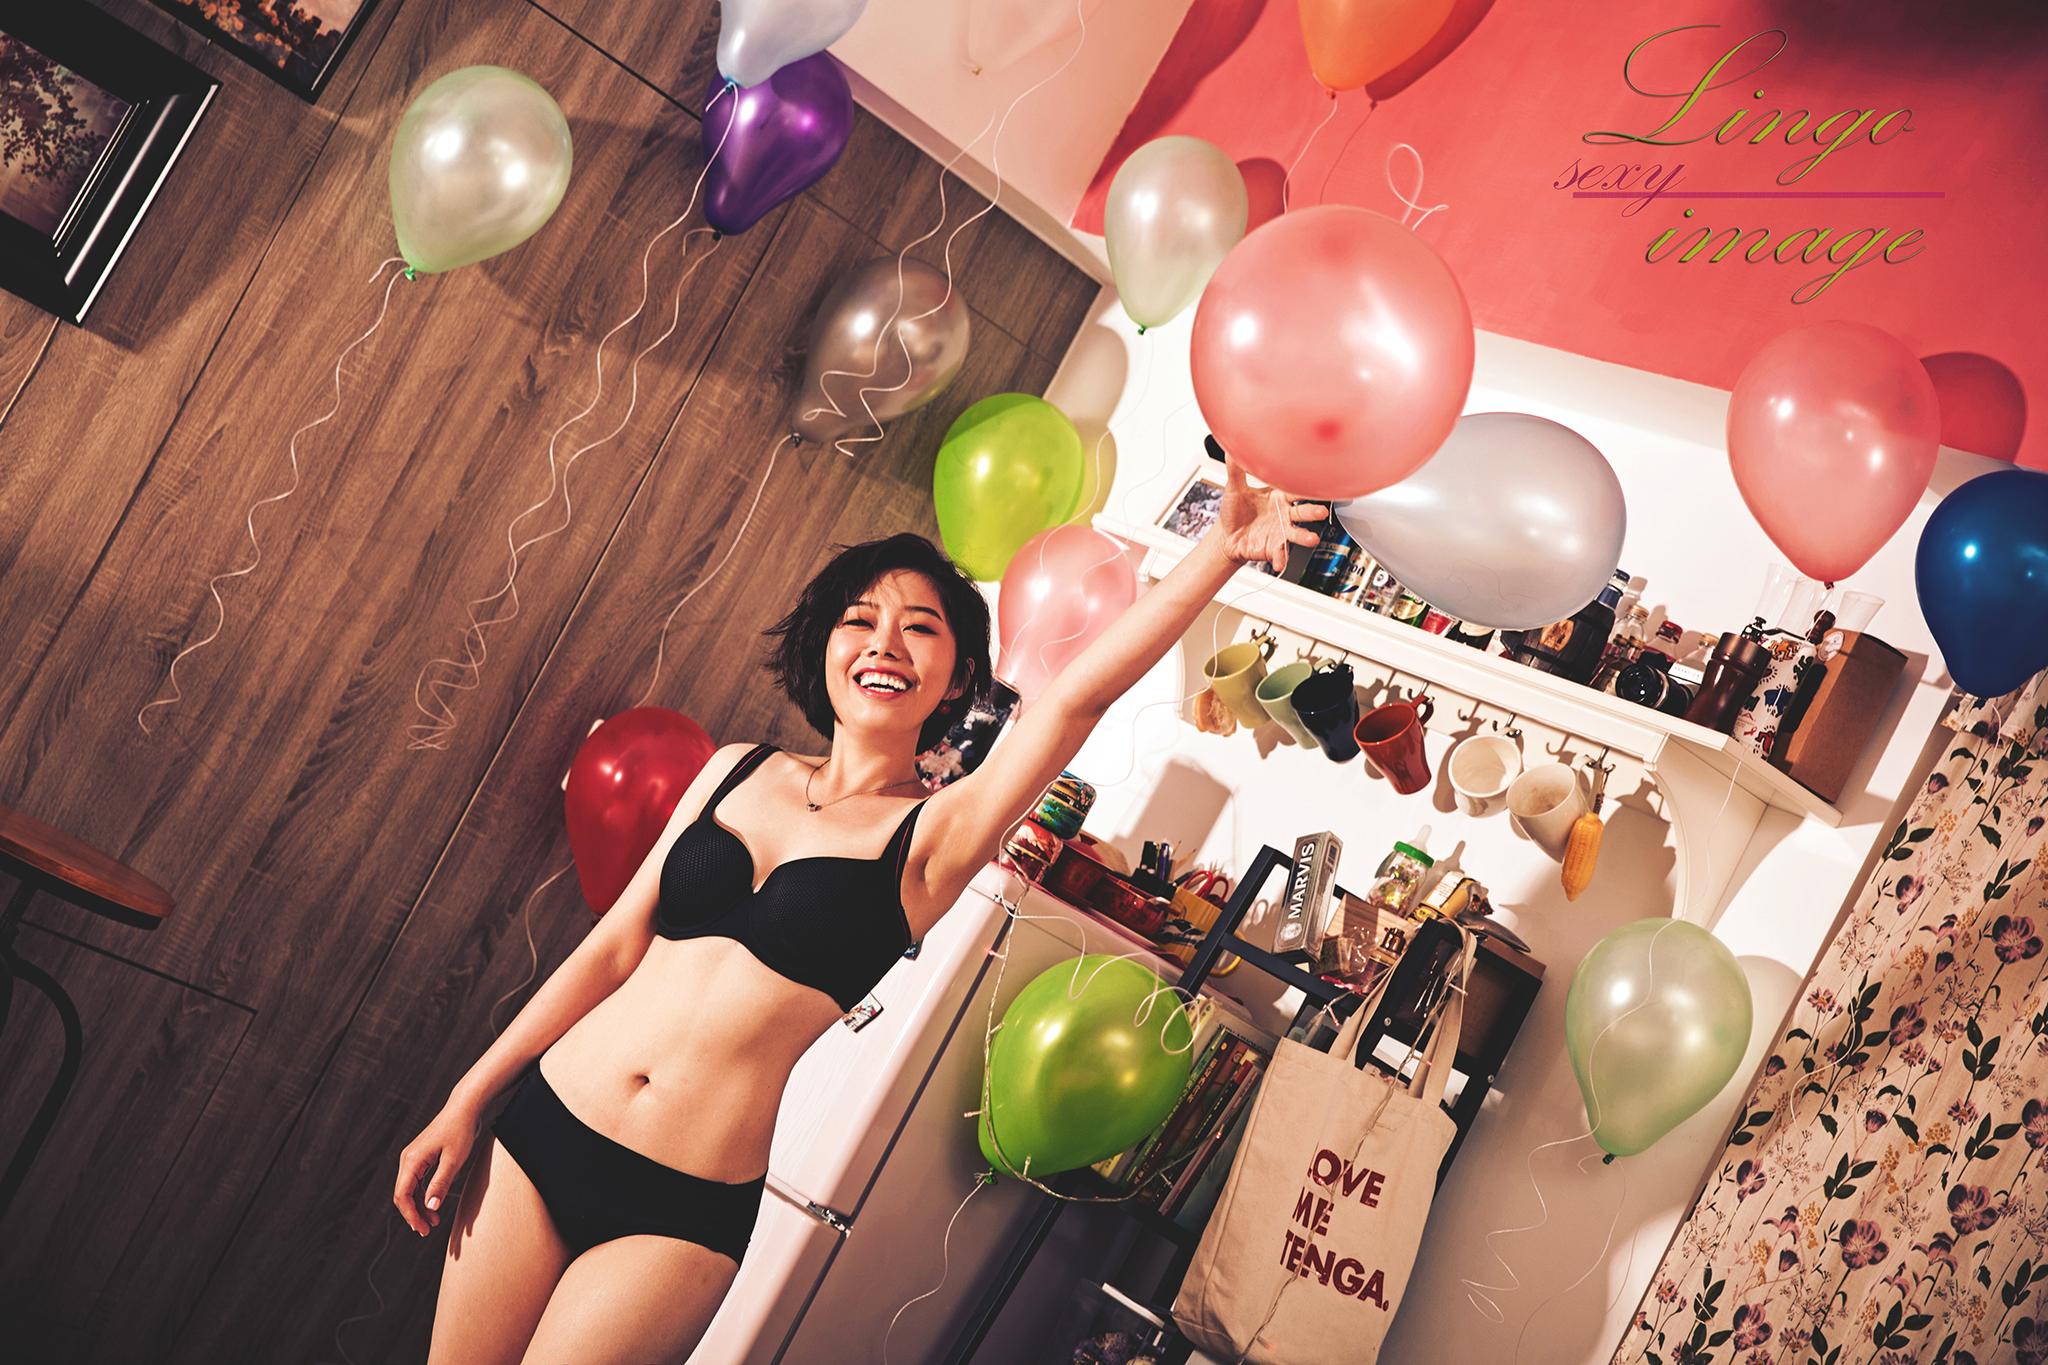 Lingo image_sexy53